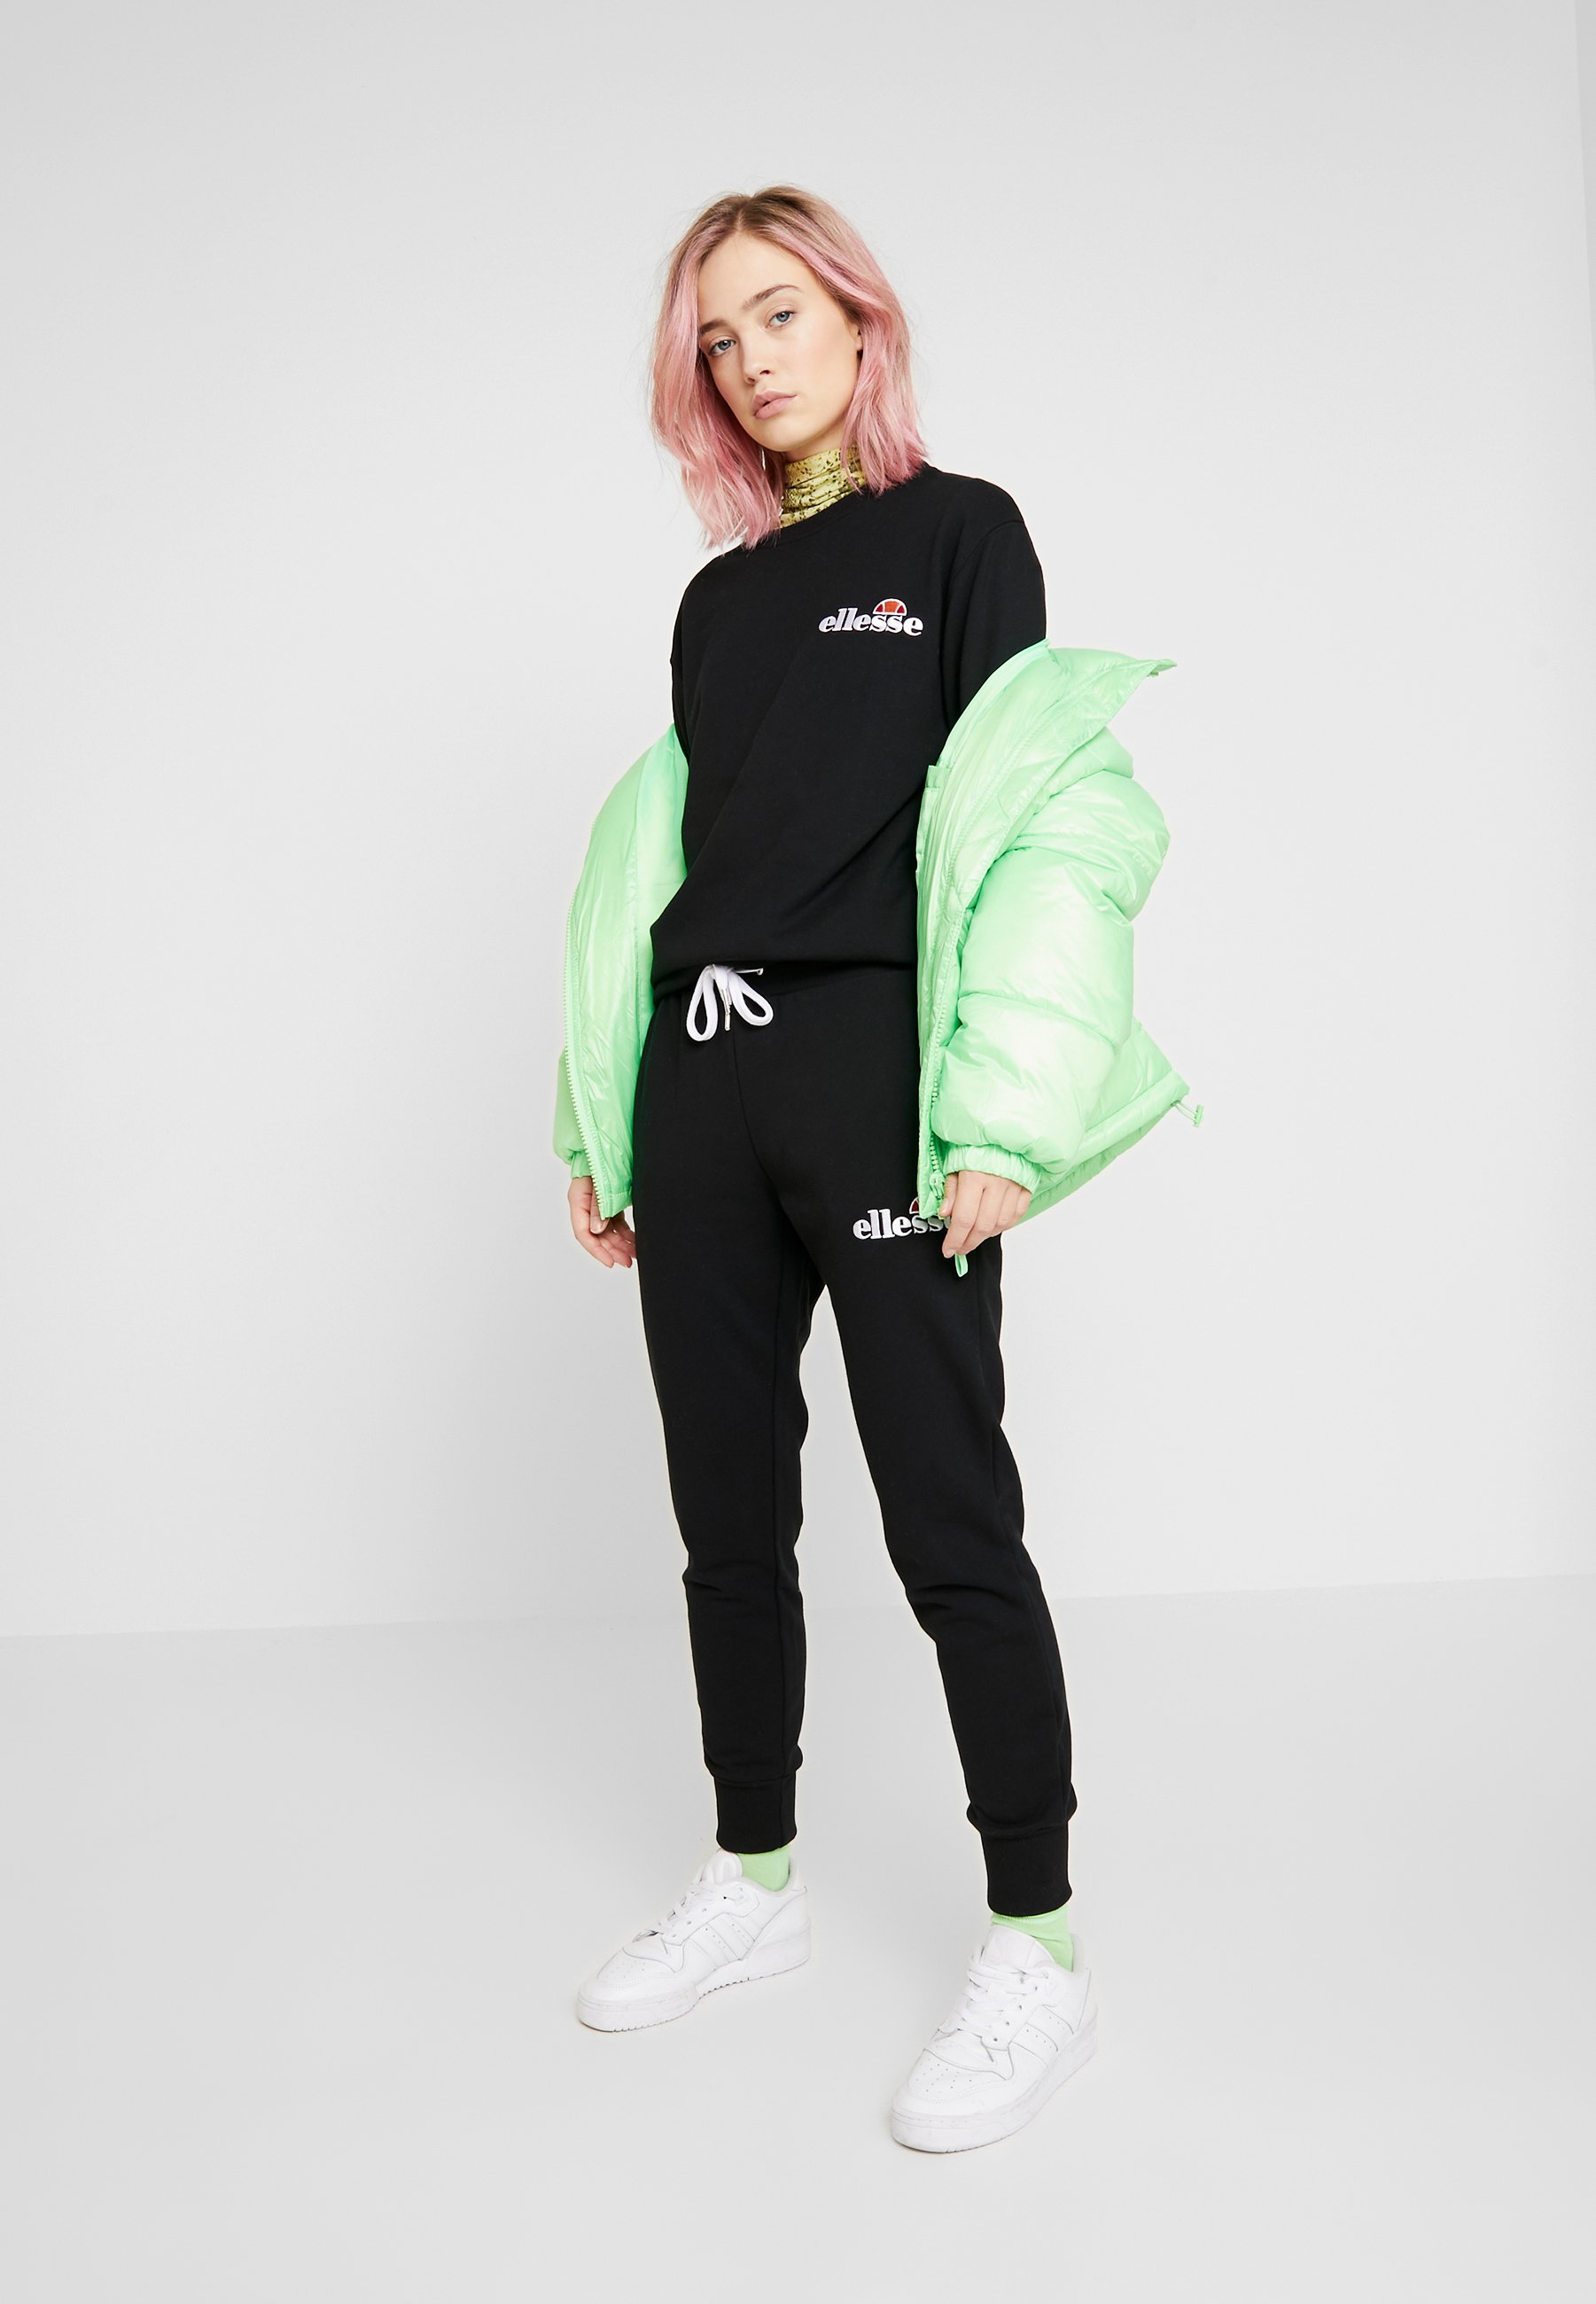 Ellesse Frivola - Pantalon De Survêtement Black